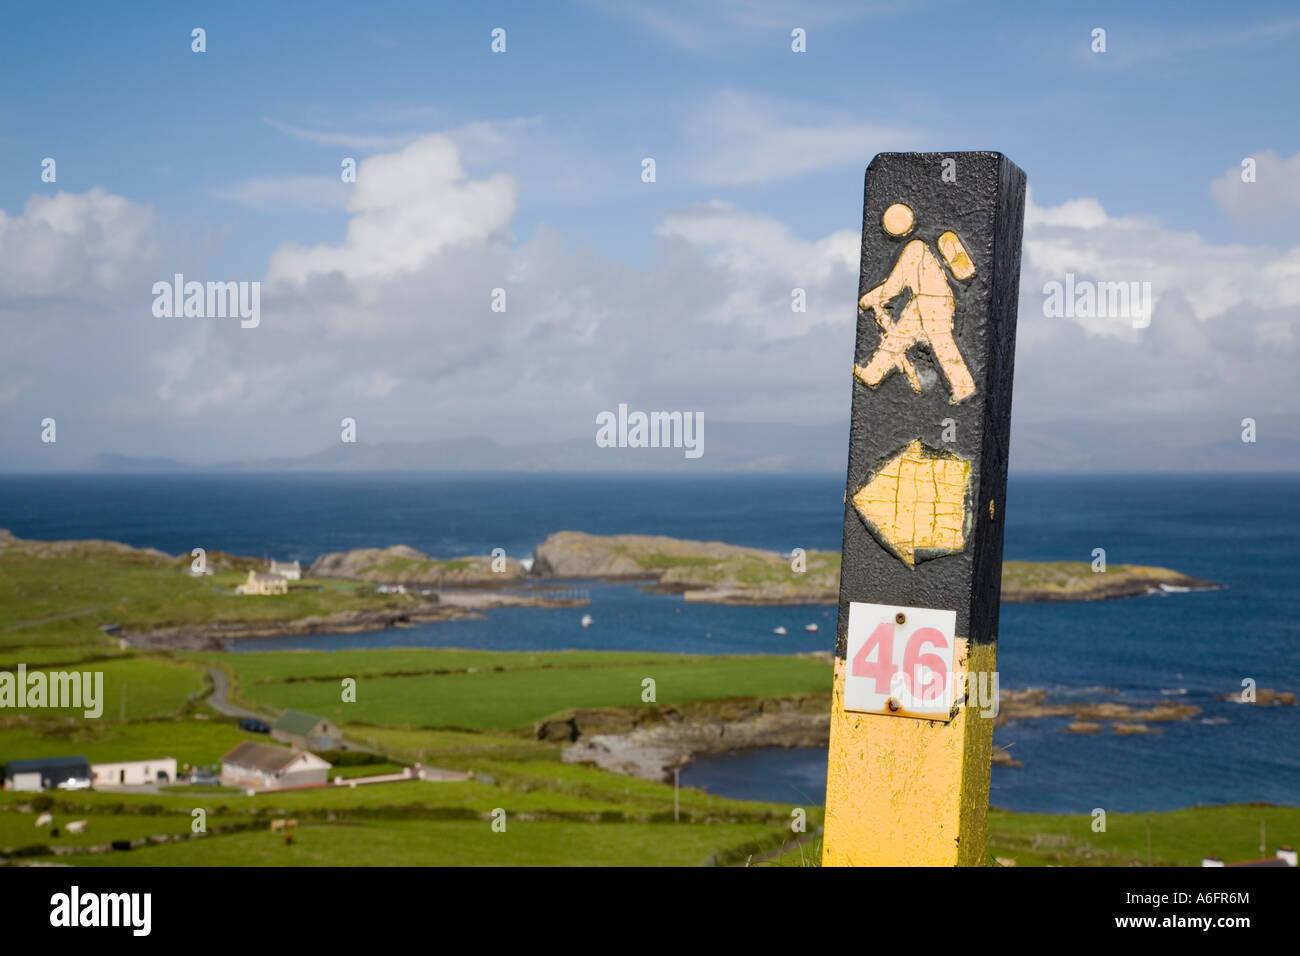 Beara Way long distance walk sign on 'Ring of Beara' route on Beara Peninsula Garnish Point County Cork - Stock Image